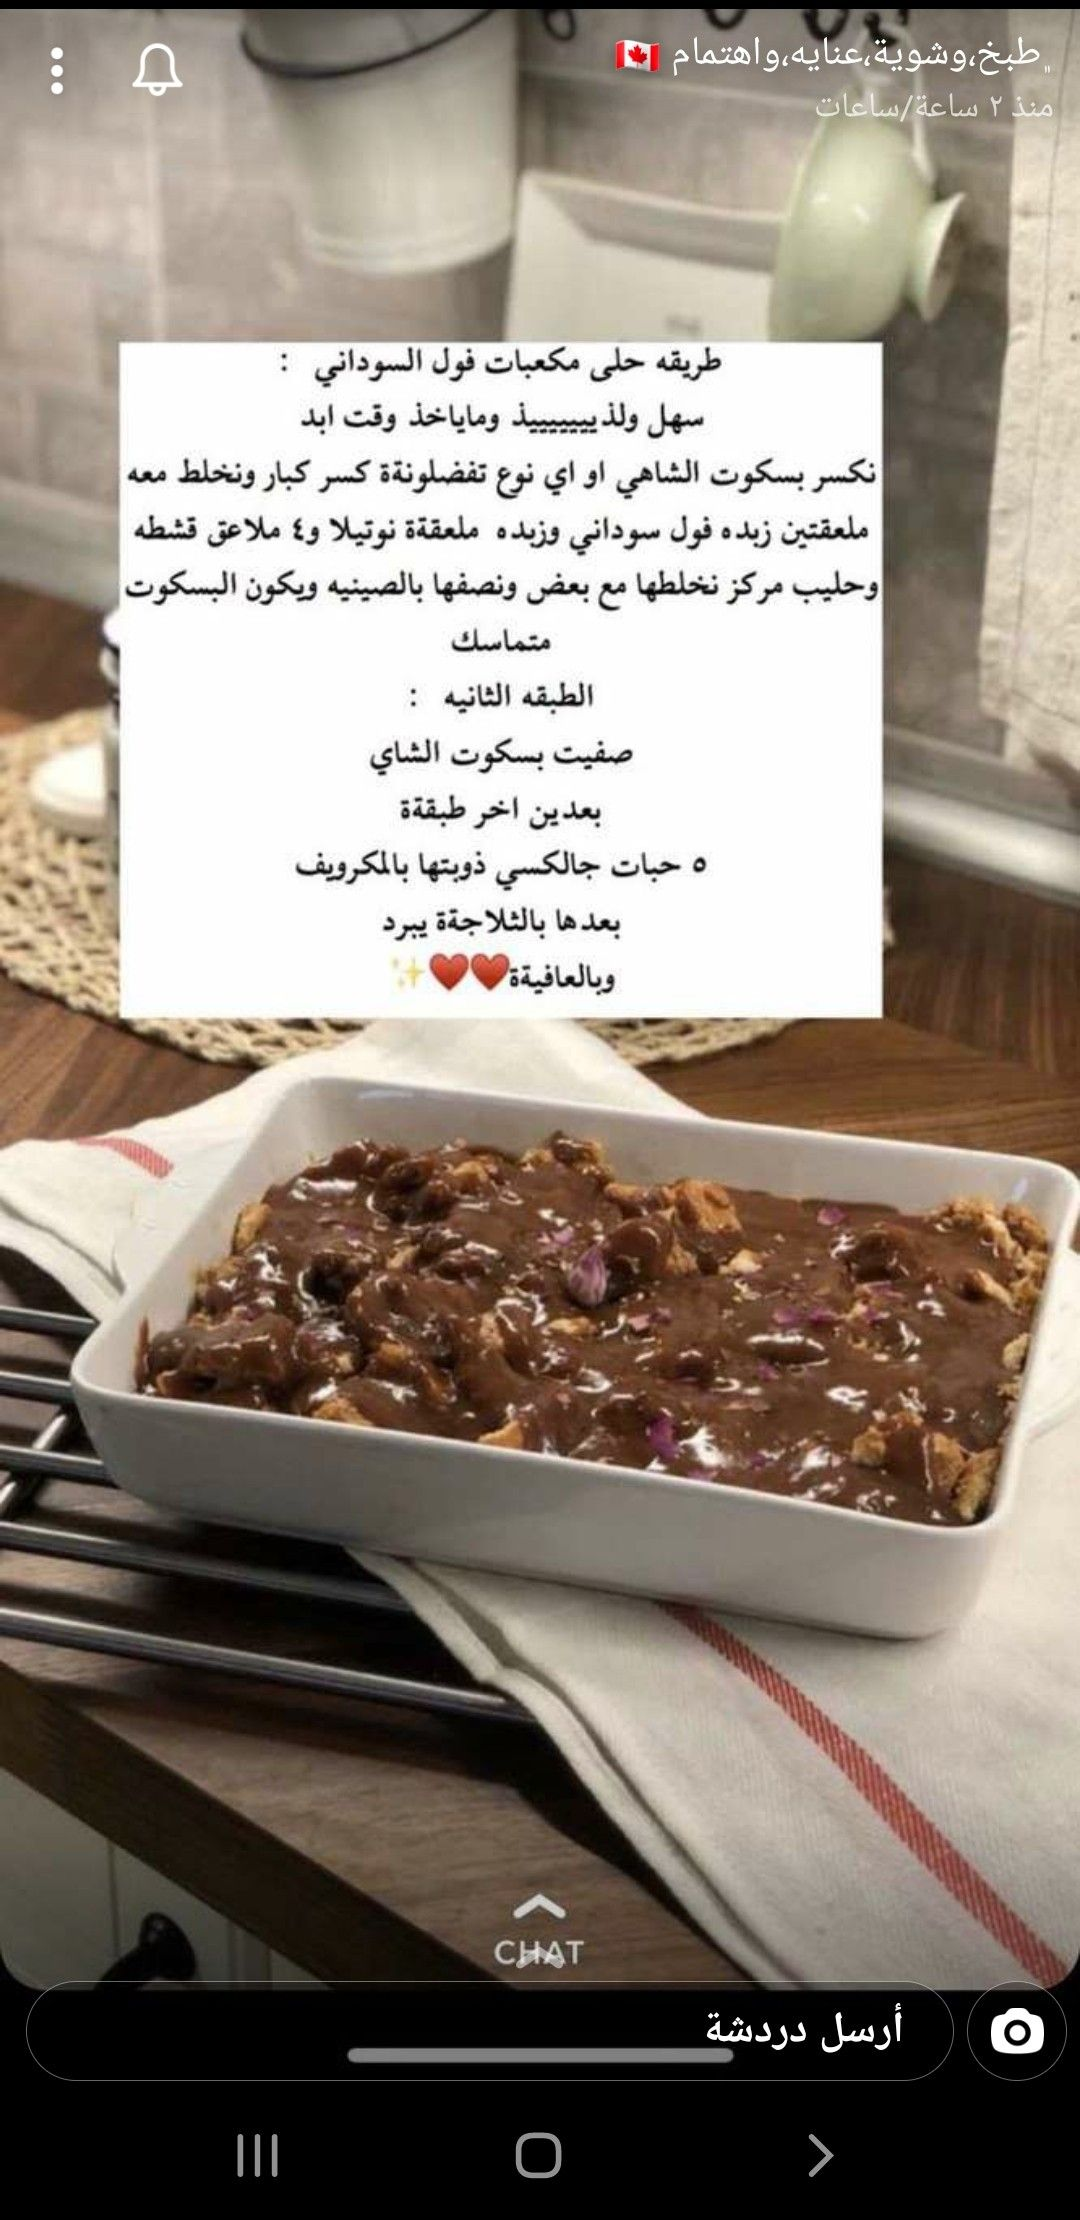 Chocolate Barks قطع الشوكولاتة حلى سريع Healty Food Food Cooking